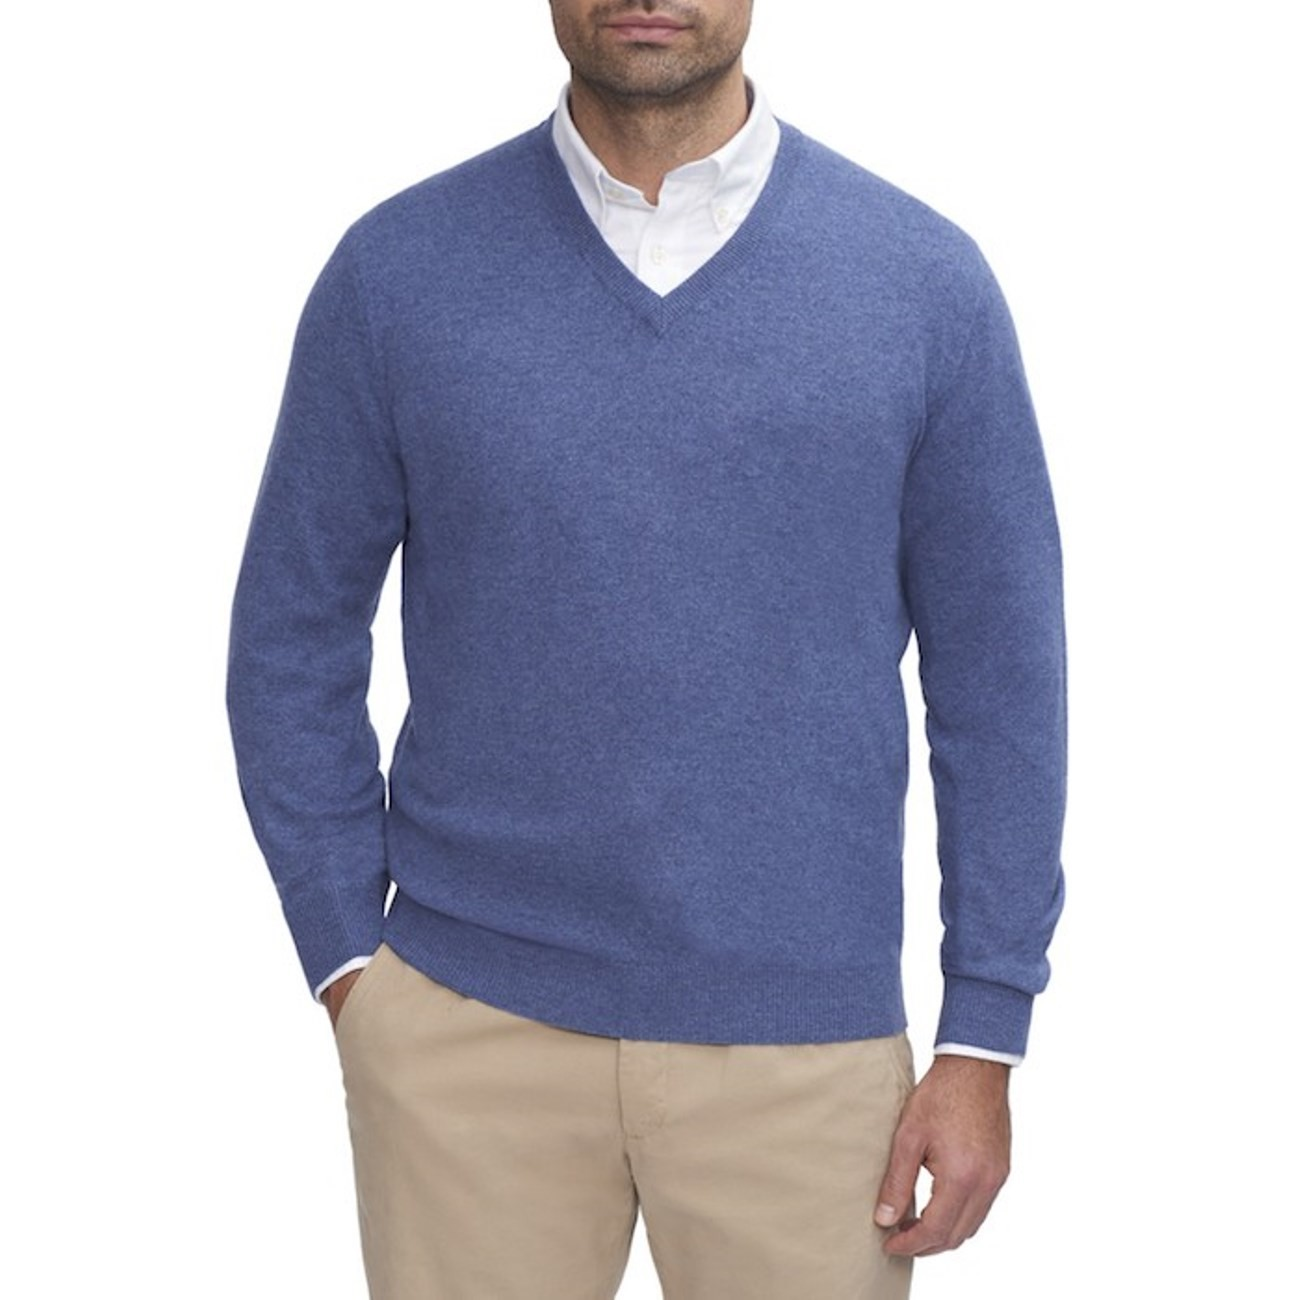 Mens Blue V-Neck Sweater - 100% Cashmere Made in Scotland